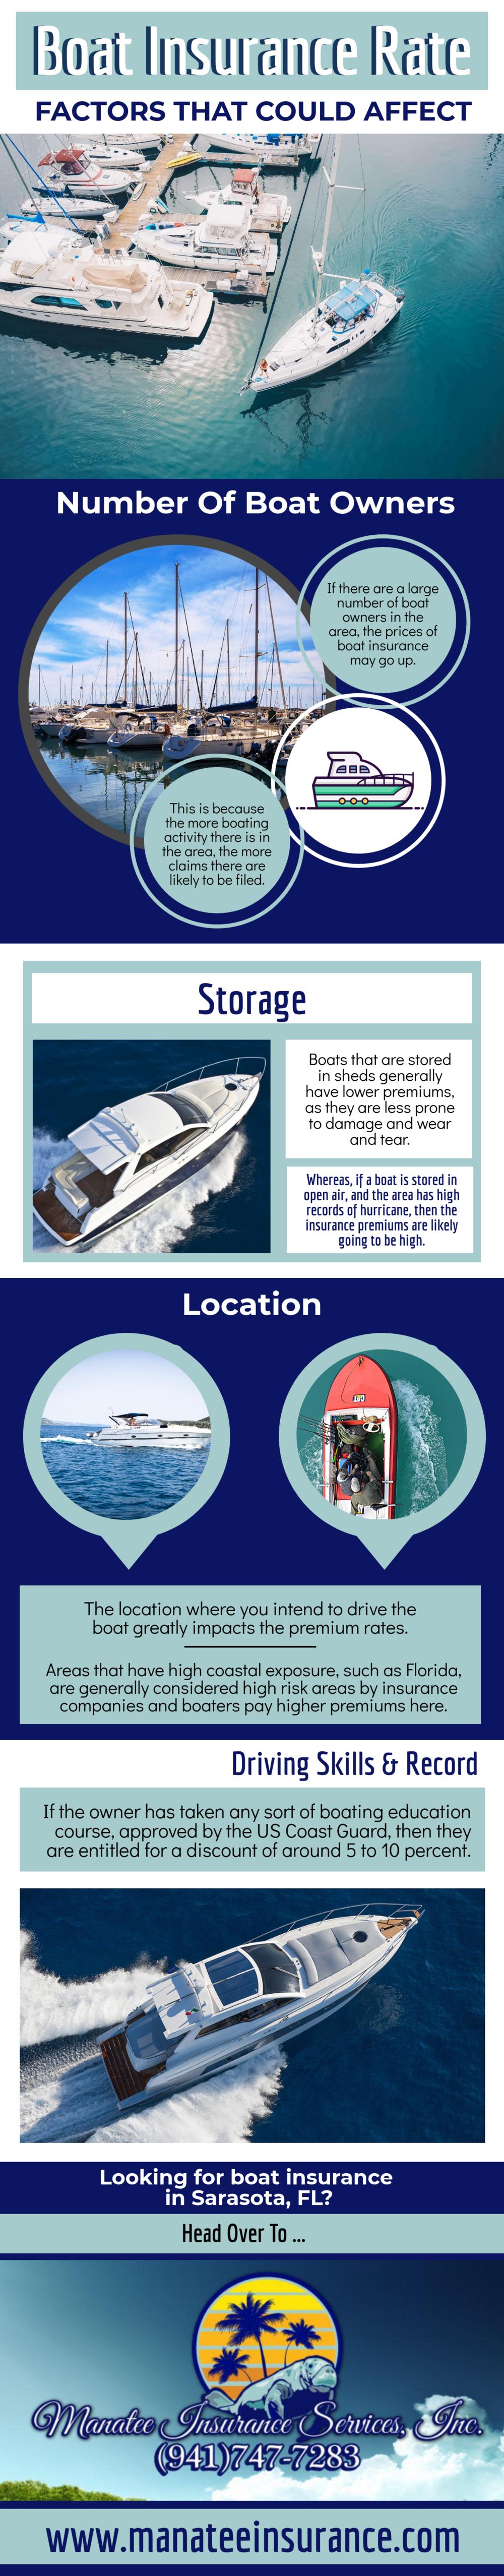 Boat insurance premium